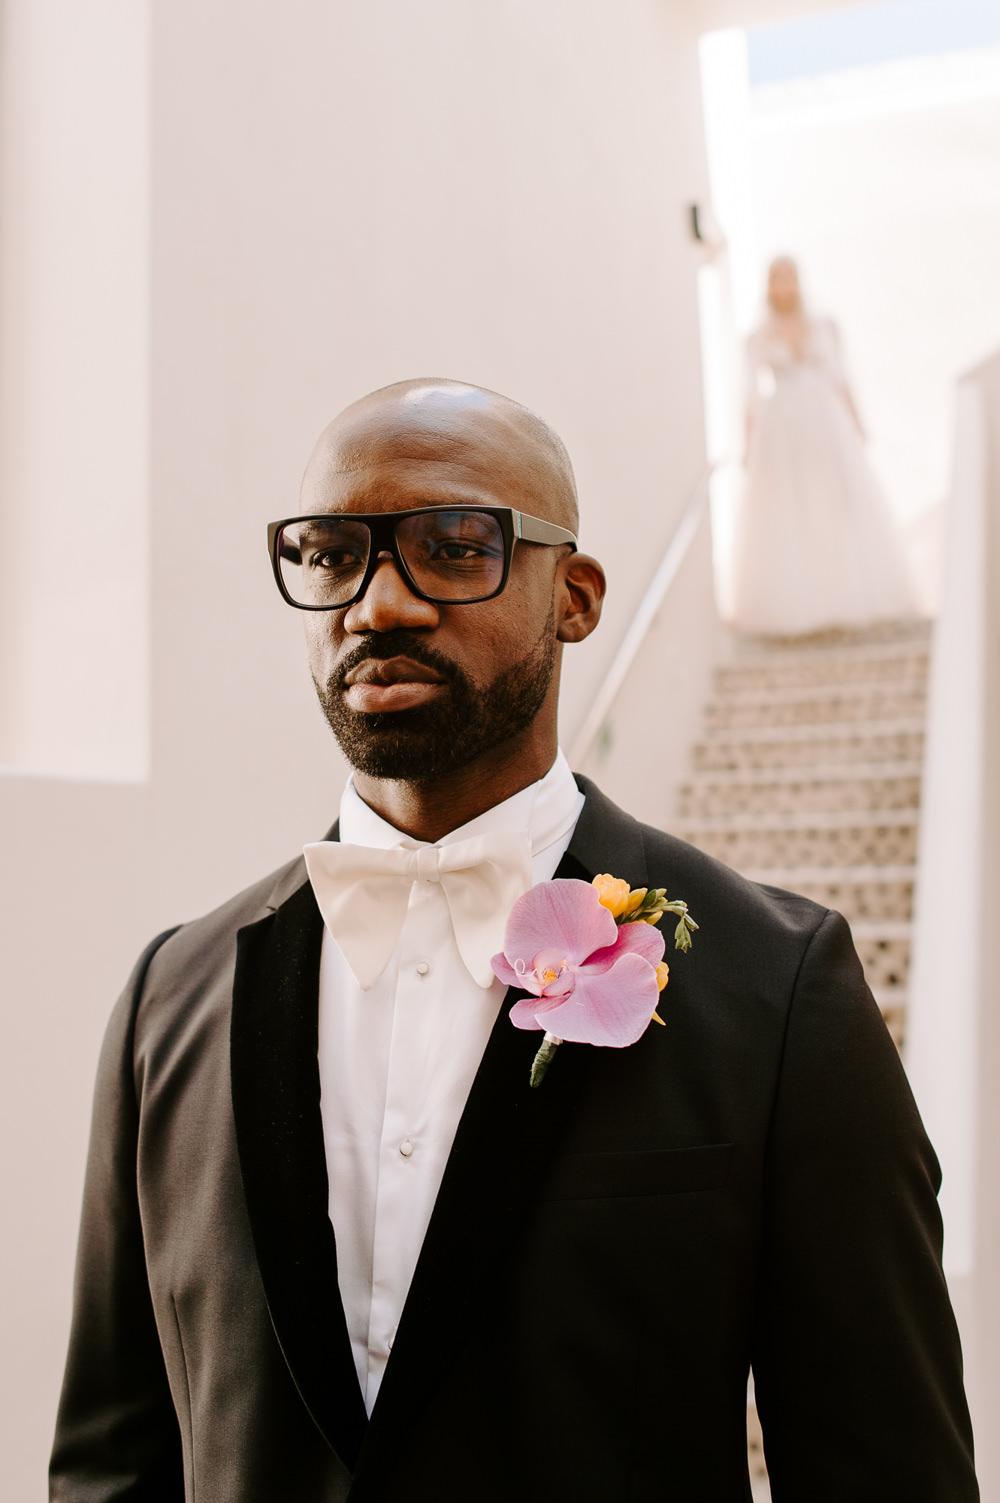 Groom Glasses Black Suit Tux Tuxedo Bow Tie Santorini Wedding Phosart Photography